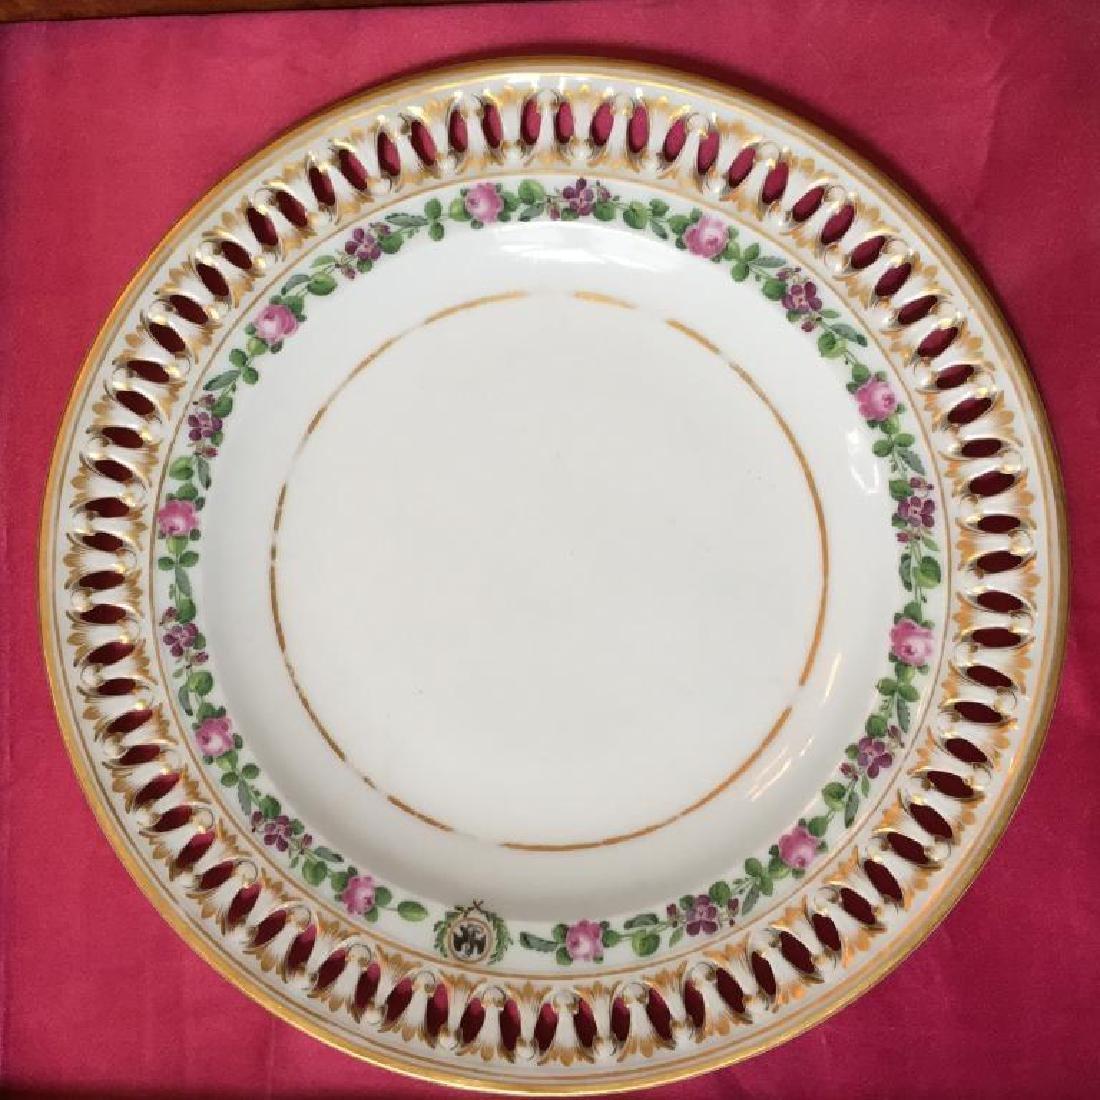 19thc German Meissen Museum Cased Plate - 2